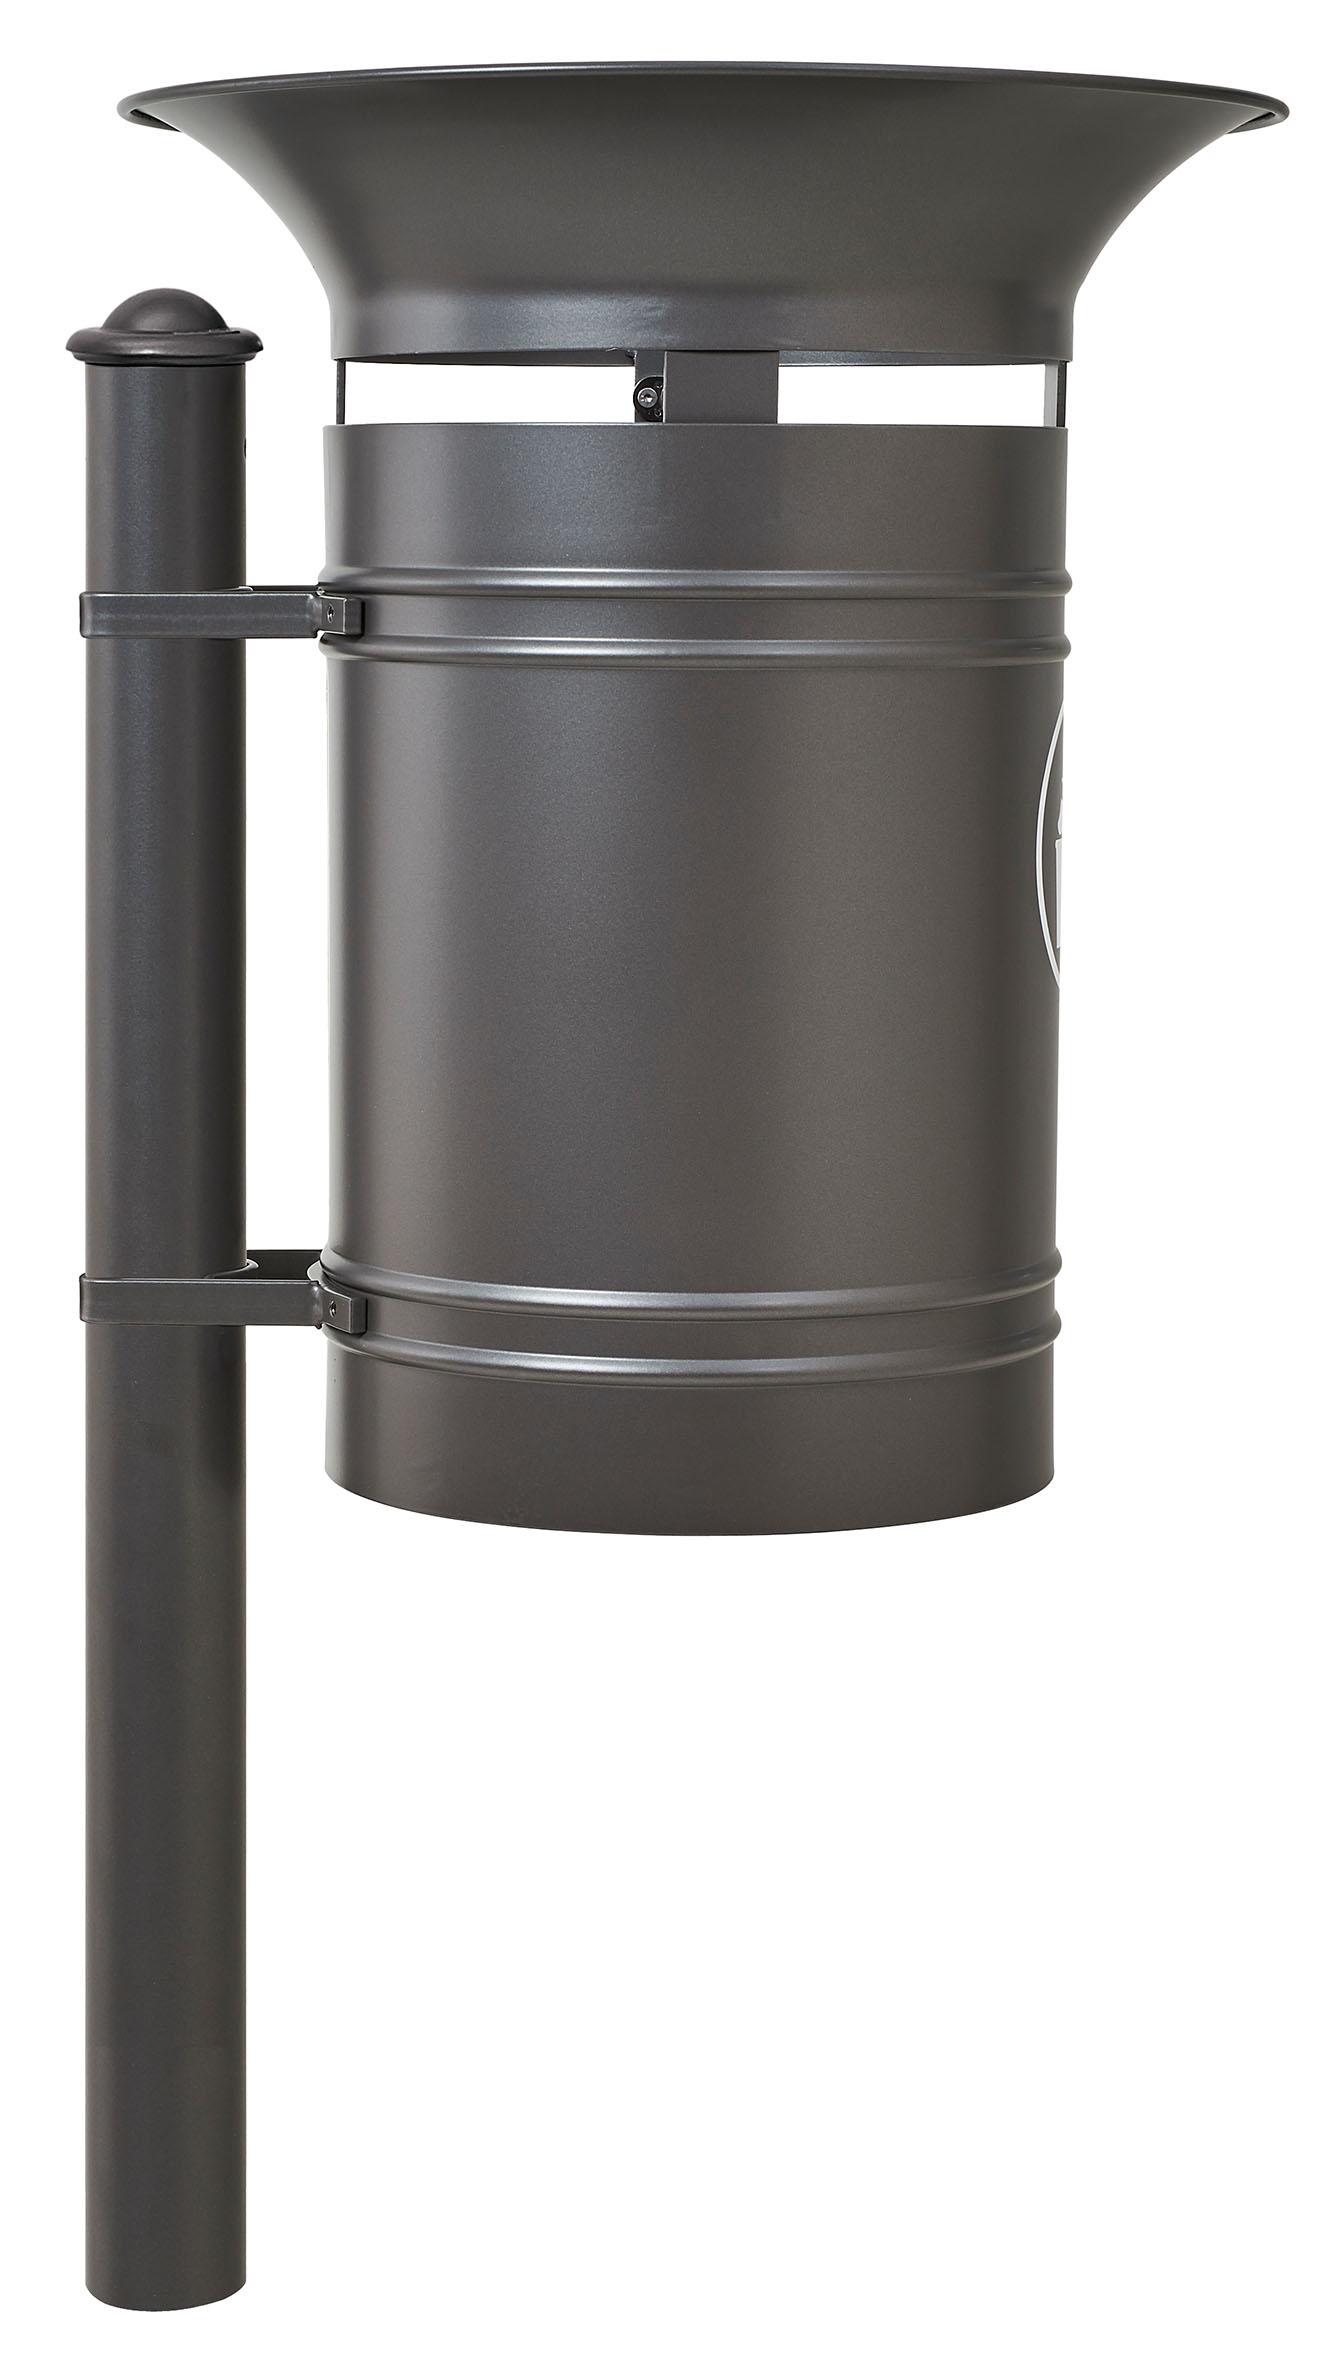 Abfallkorb Valencia 40 Liter